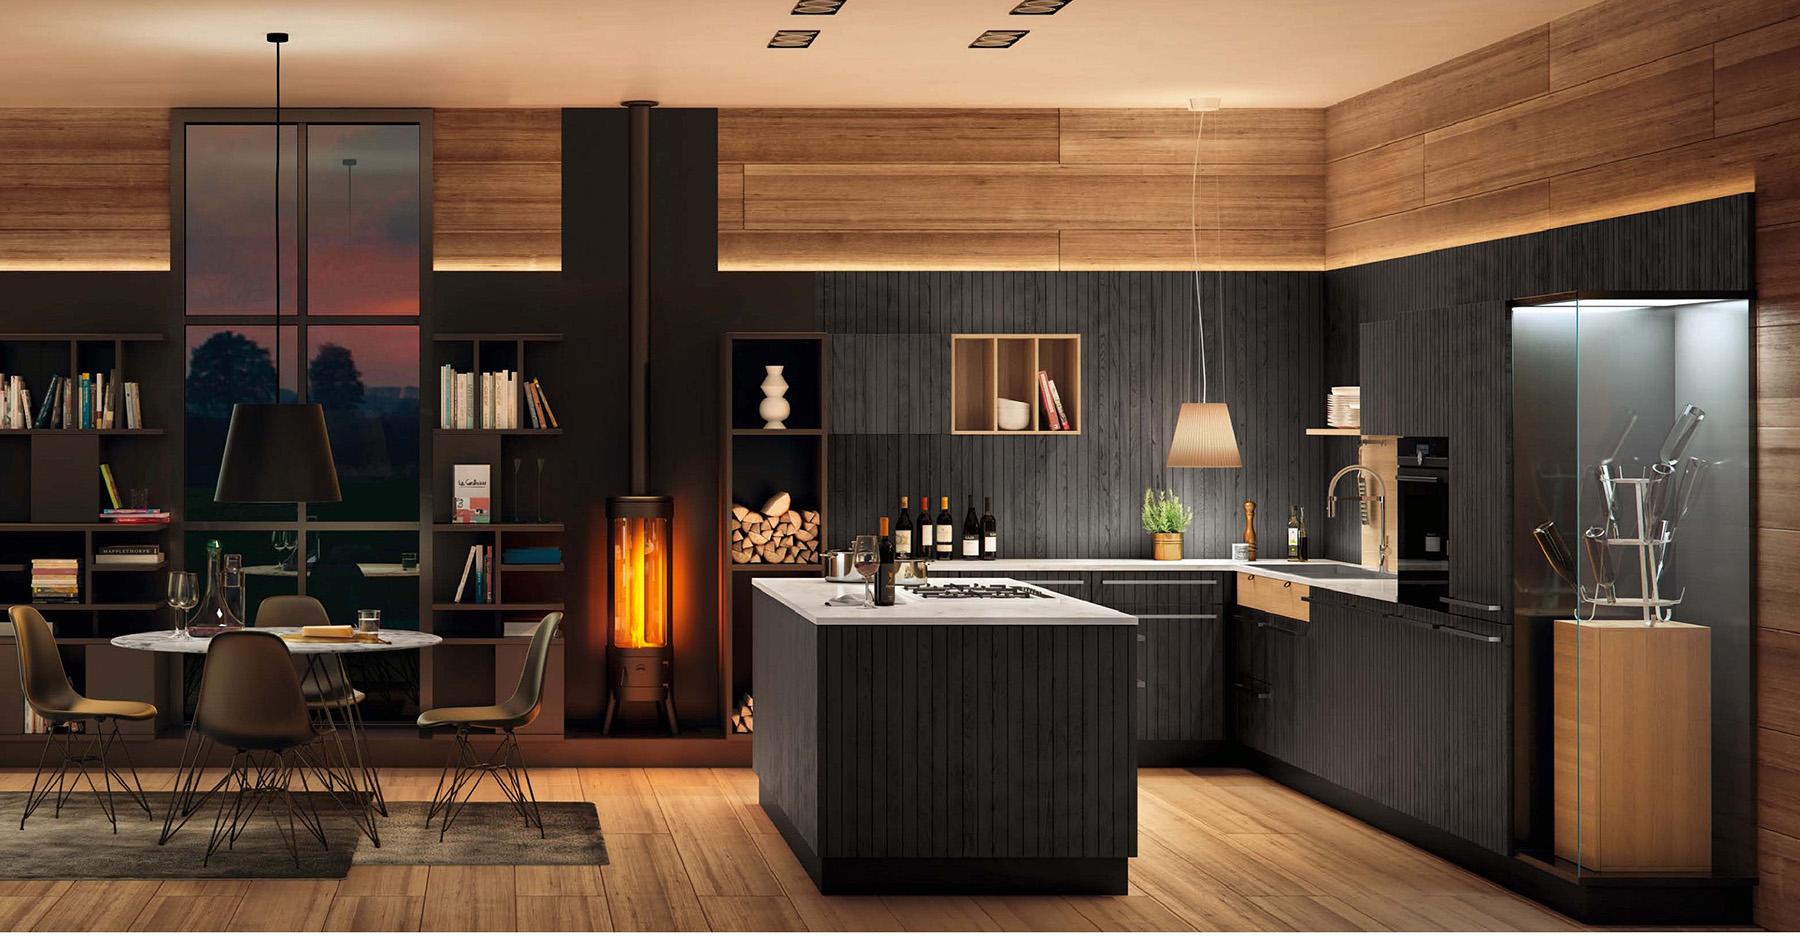 Cucine di marca cucine lube rafforza la propria presenza - Cucine di marca scontate ...